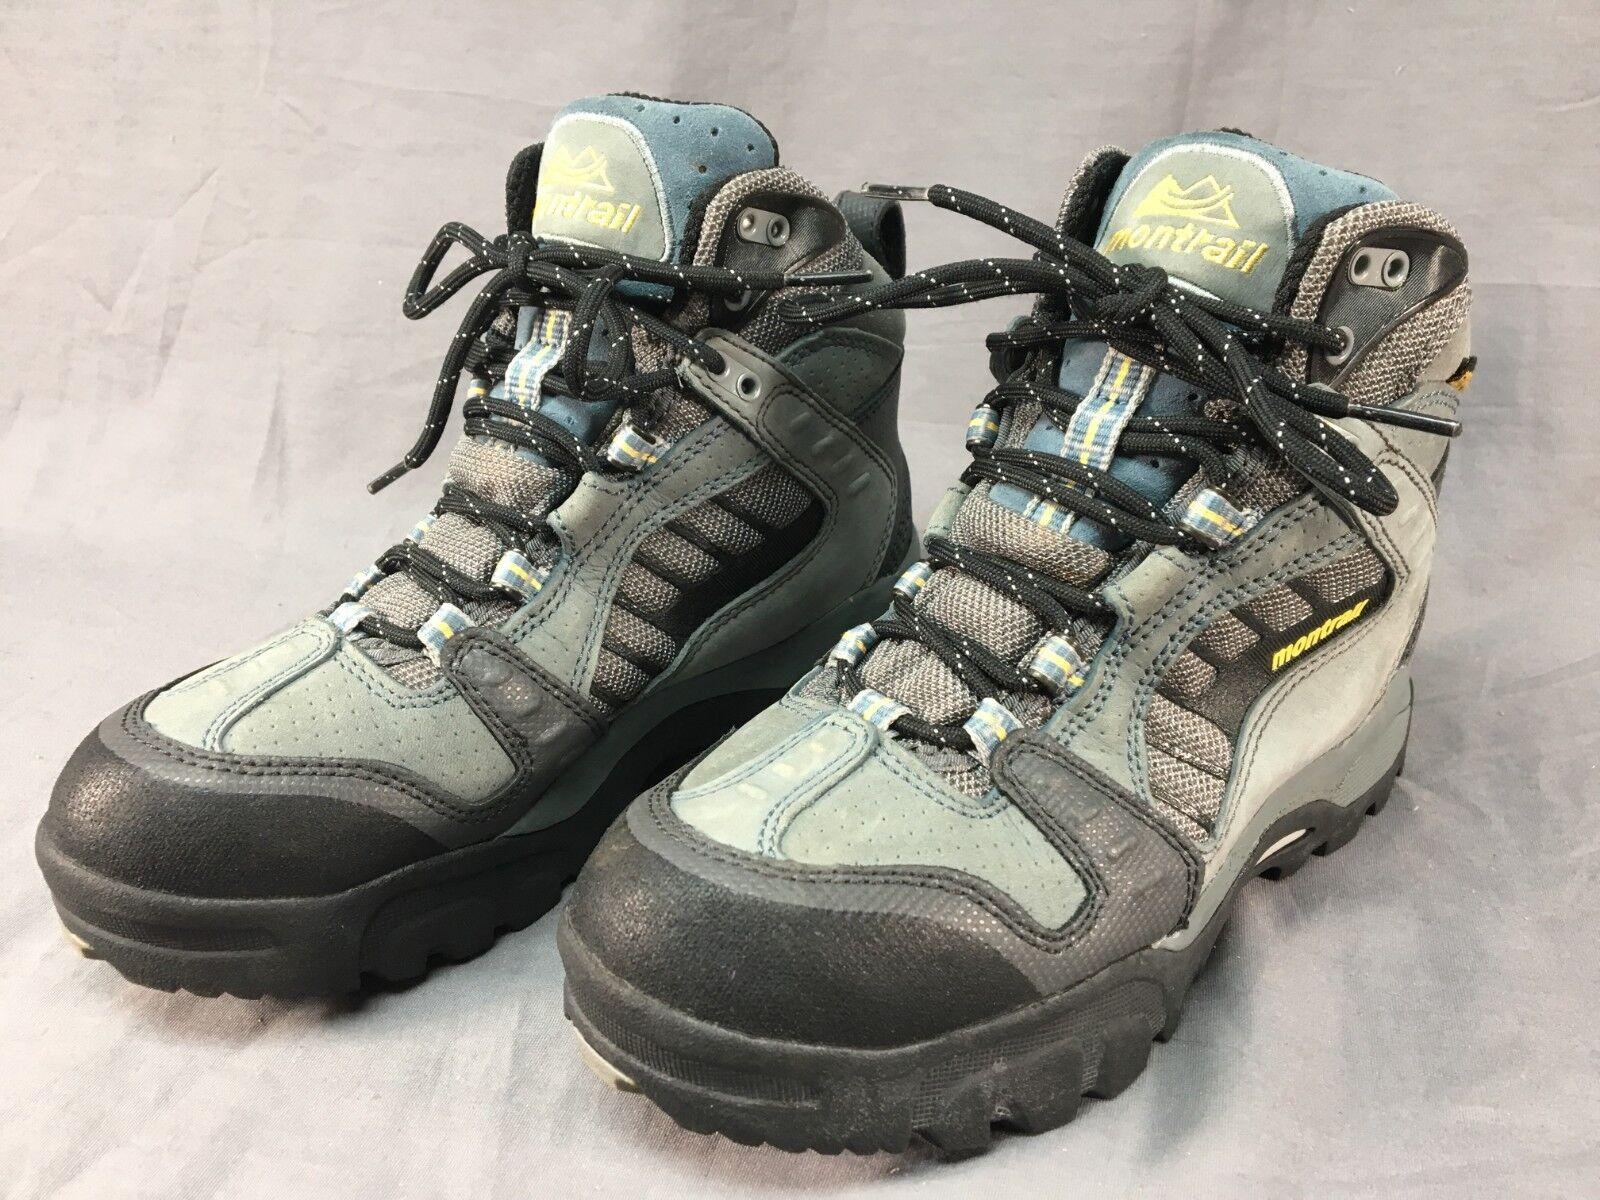 Montrail Genkena 1788 Women's US 6 Hiking Boots GoreTex Insulated Leather